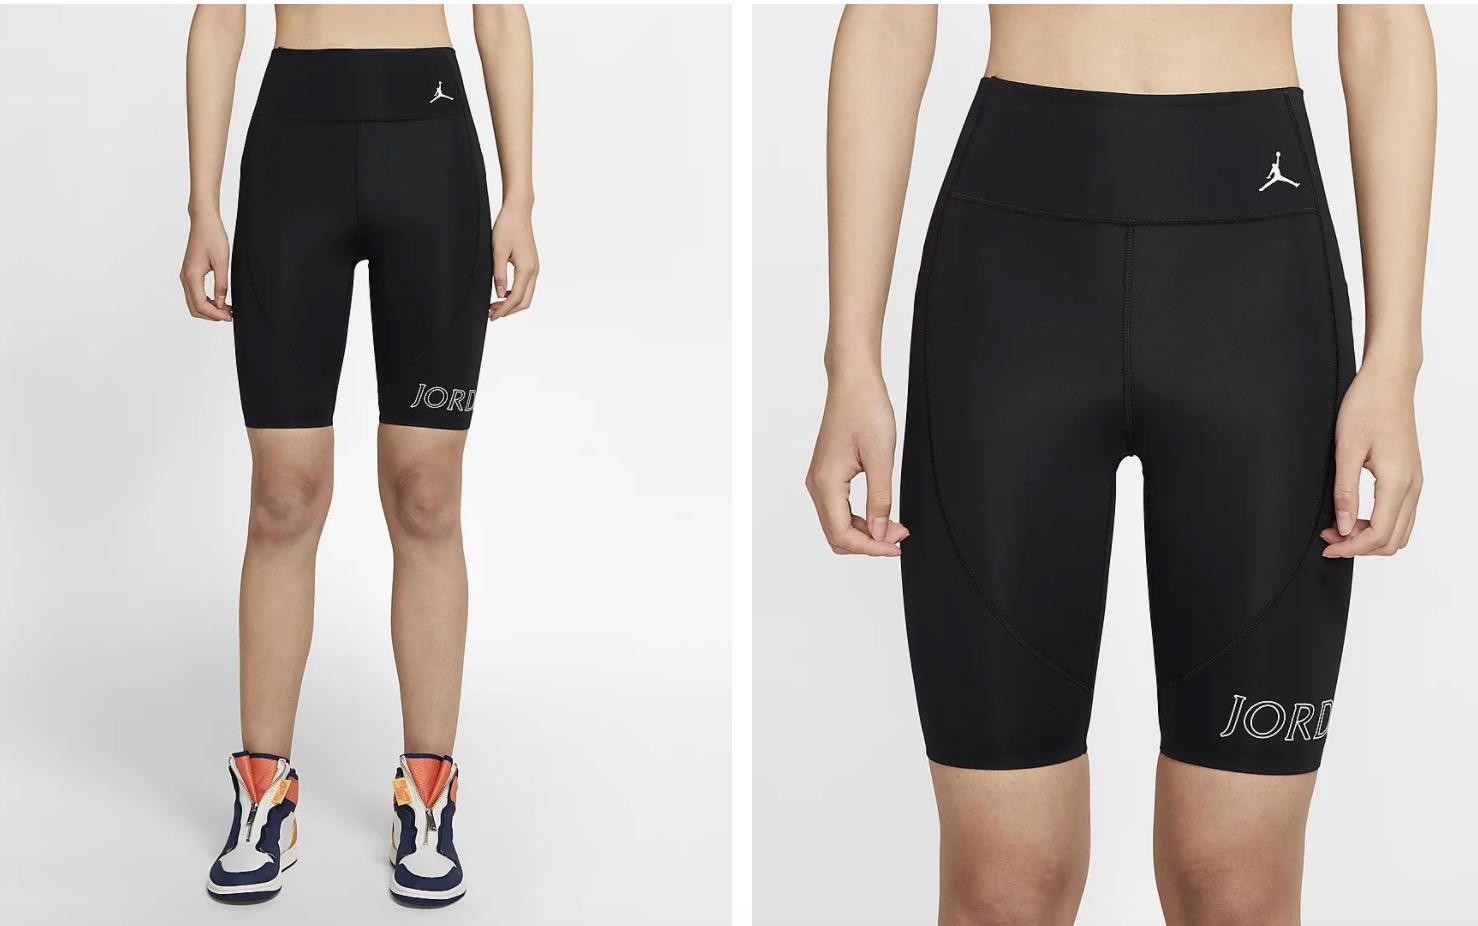 Jordan Bike Shorts Black